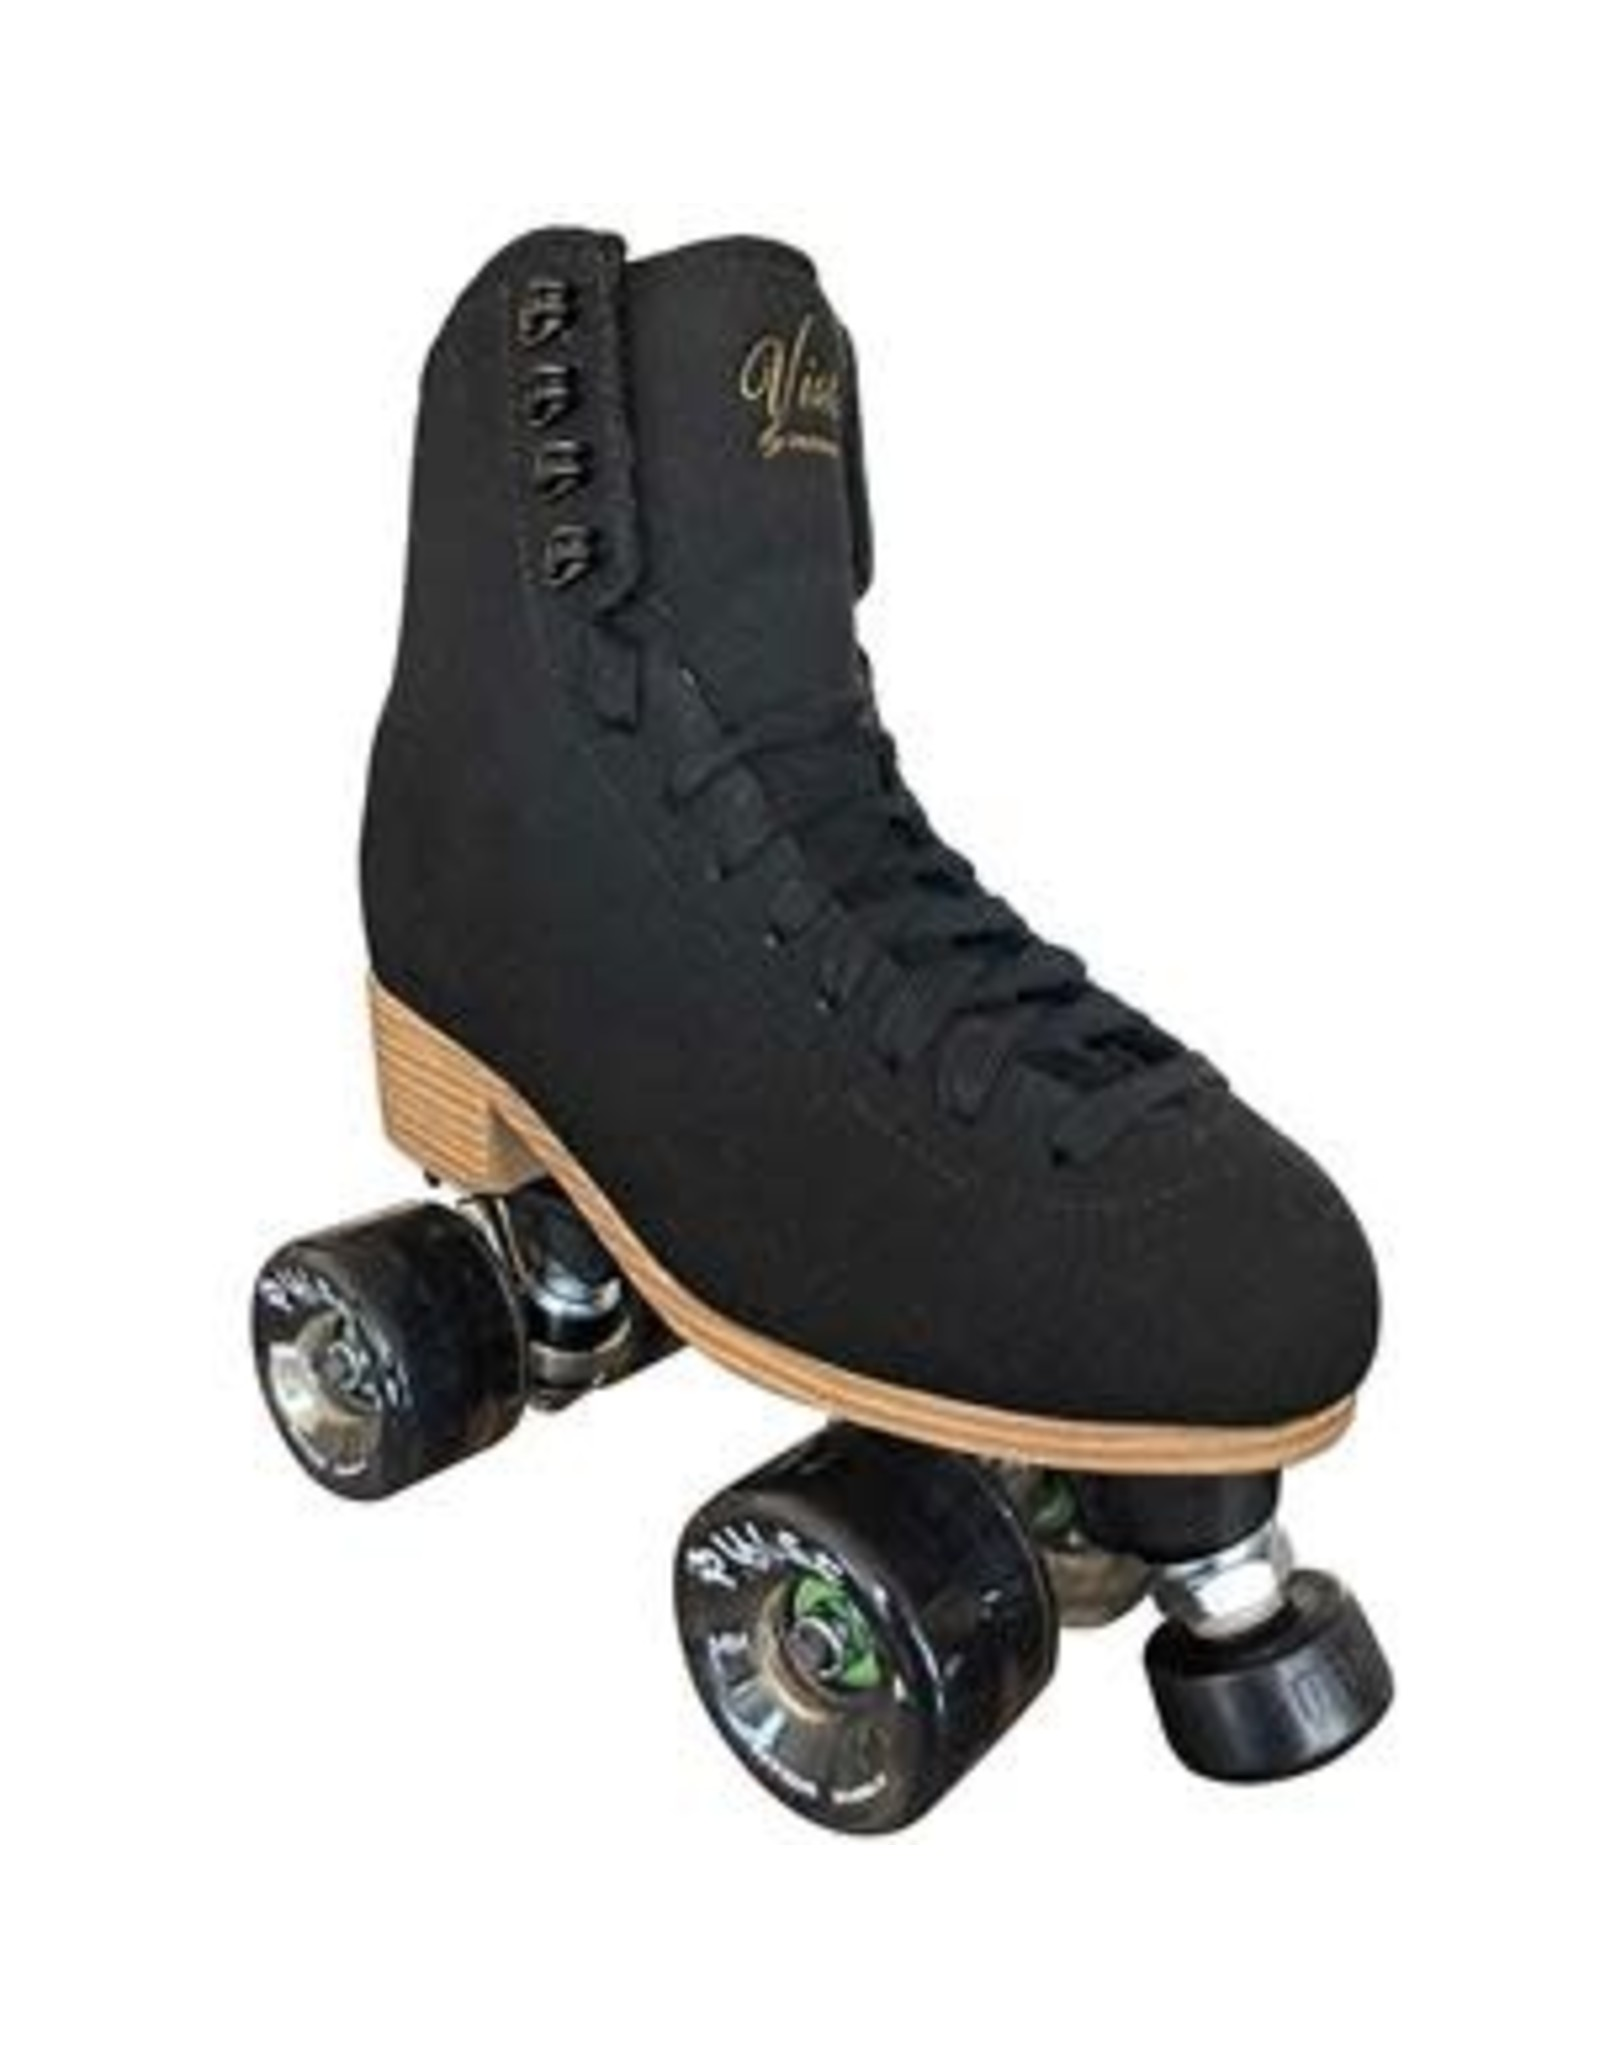 Atom Quad Jackson Vista Skate - viper plates